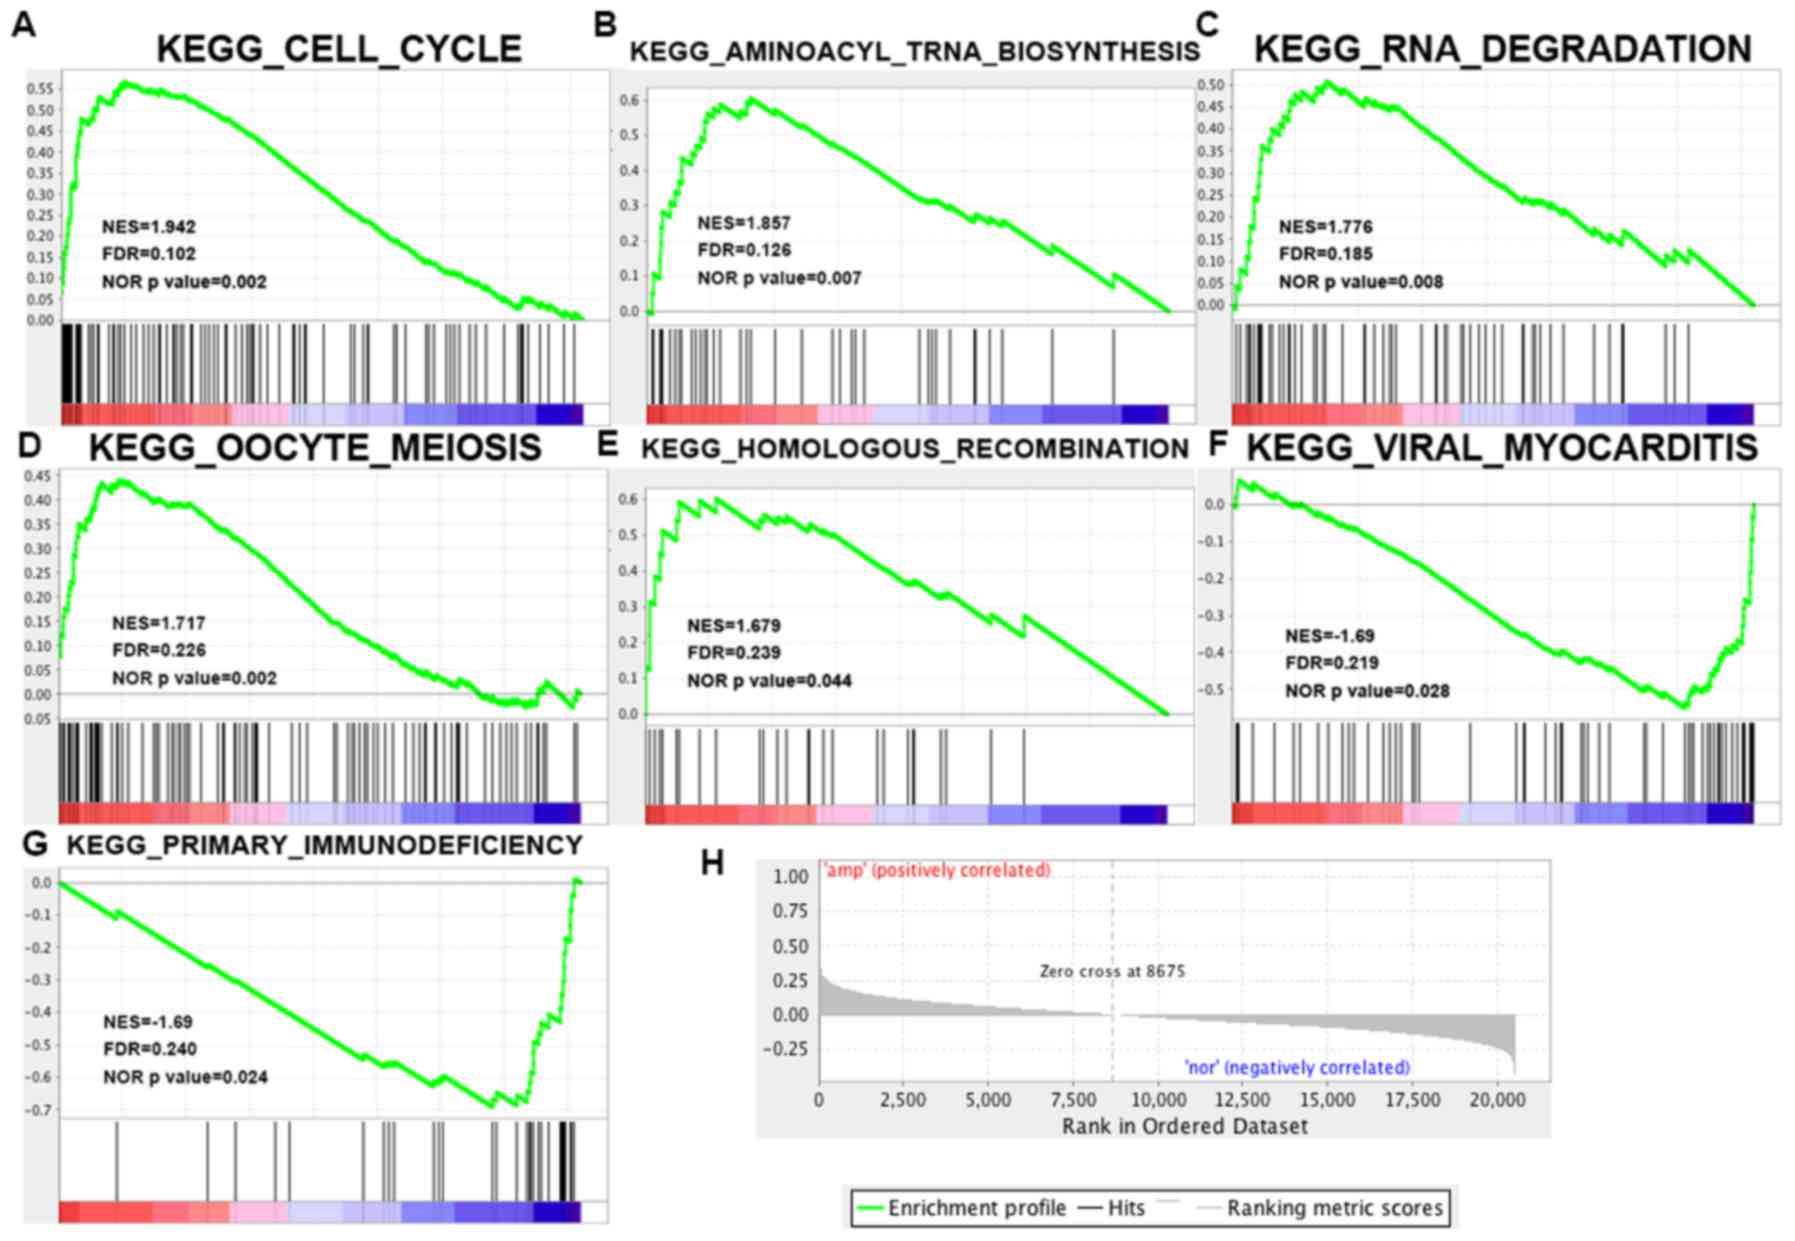 Knockdown of tyrosine 3-monooxygenase/tryptophan 5